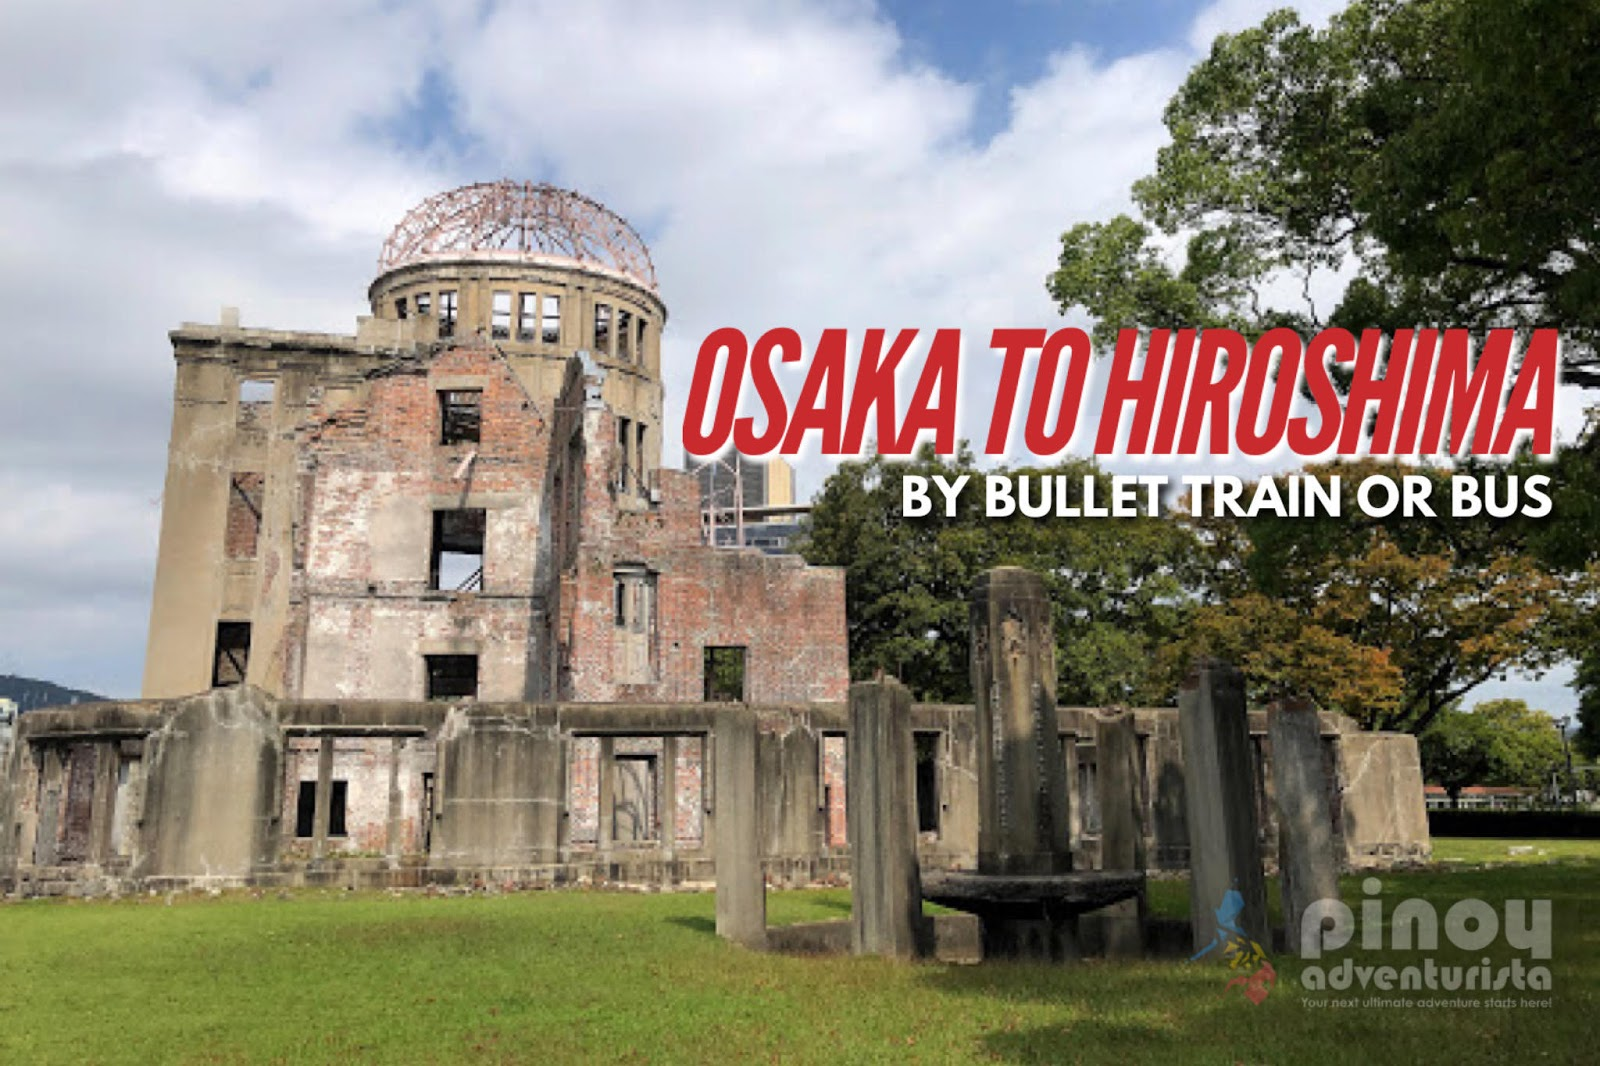 Shinkansen Or Bus? How To Travel From OSAKA To HIROSHIMA